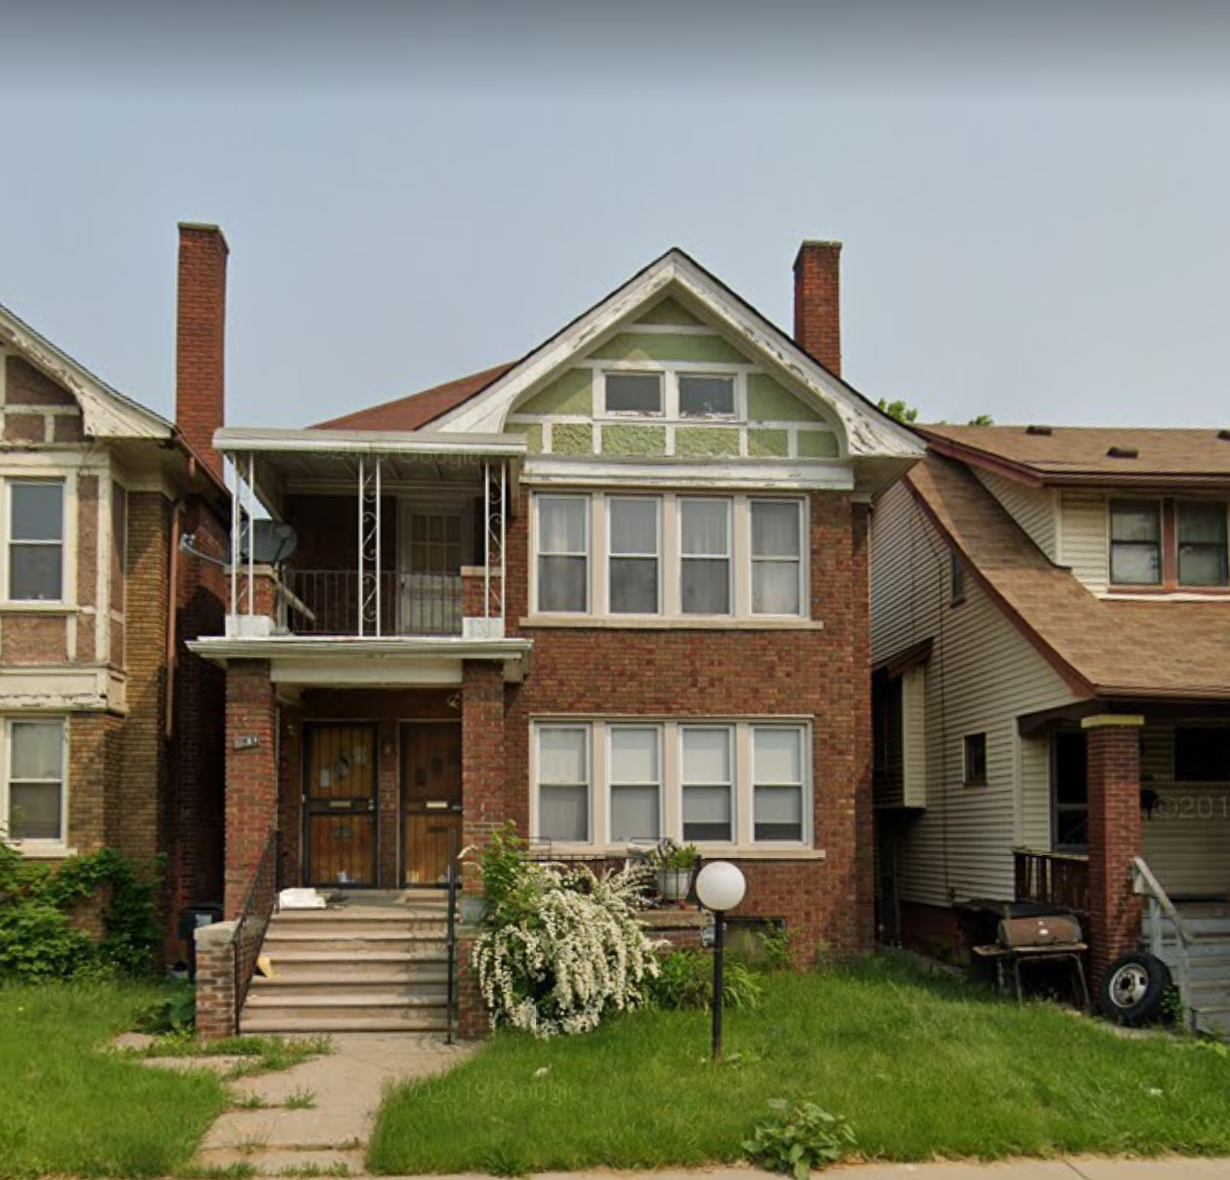 5088 Maplewood St, Detroit, MI